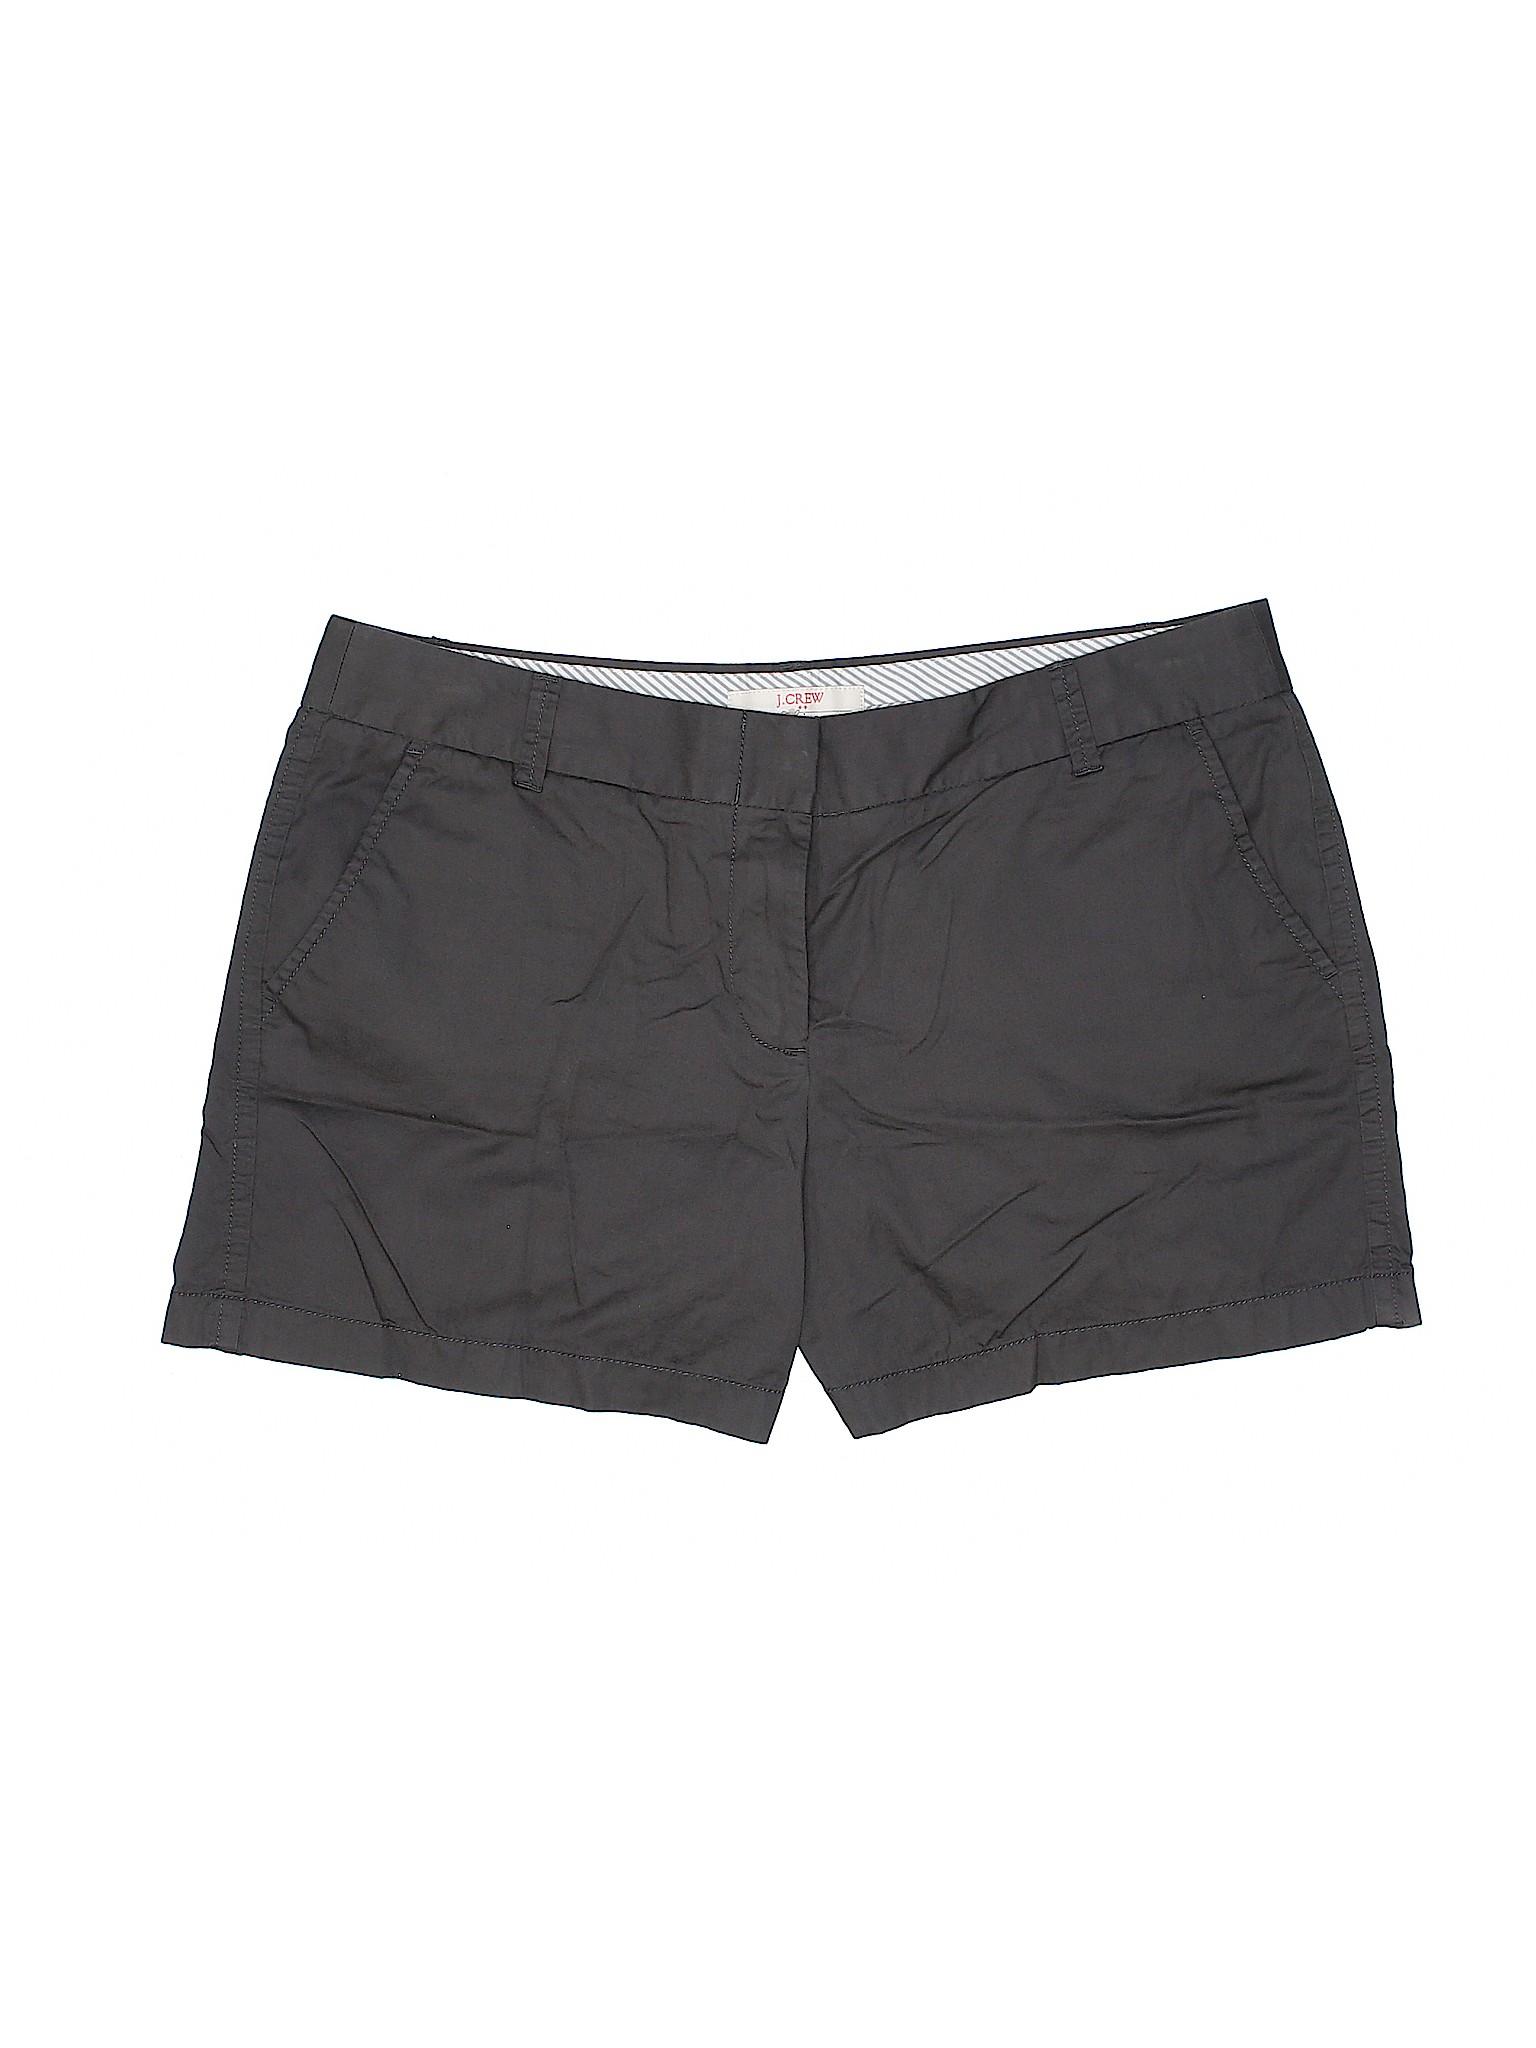 Boutique Shorts Outfitters winter American Eagle Khaki rxTrqZwHv